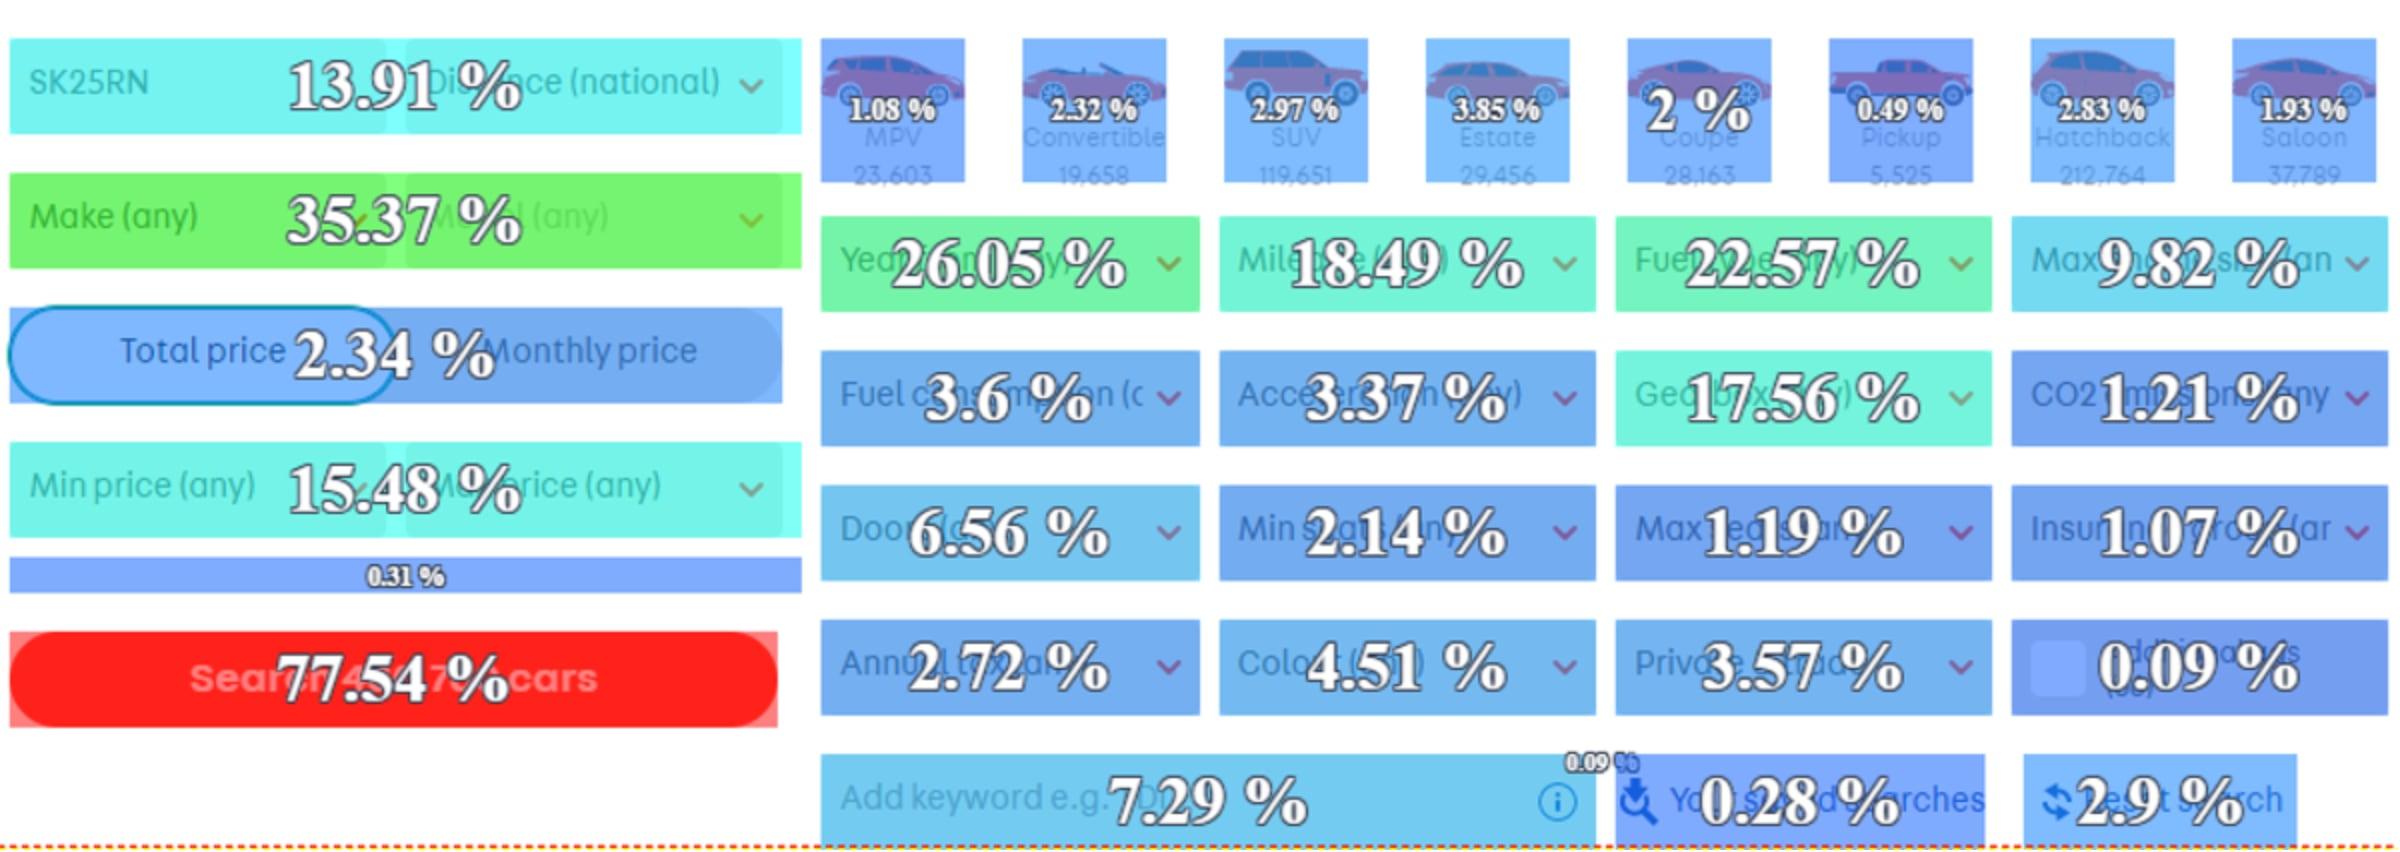 Desktop search click rate